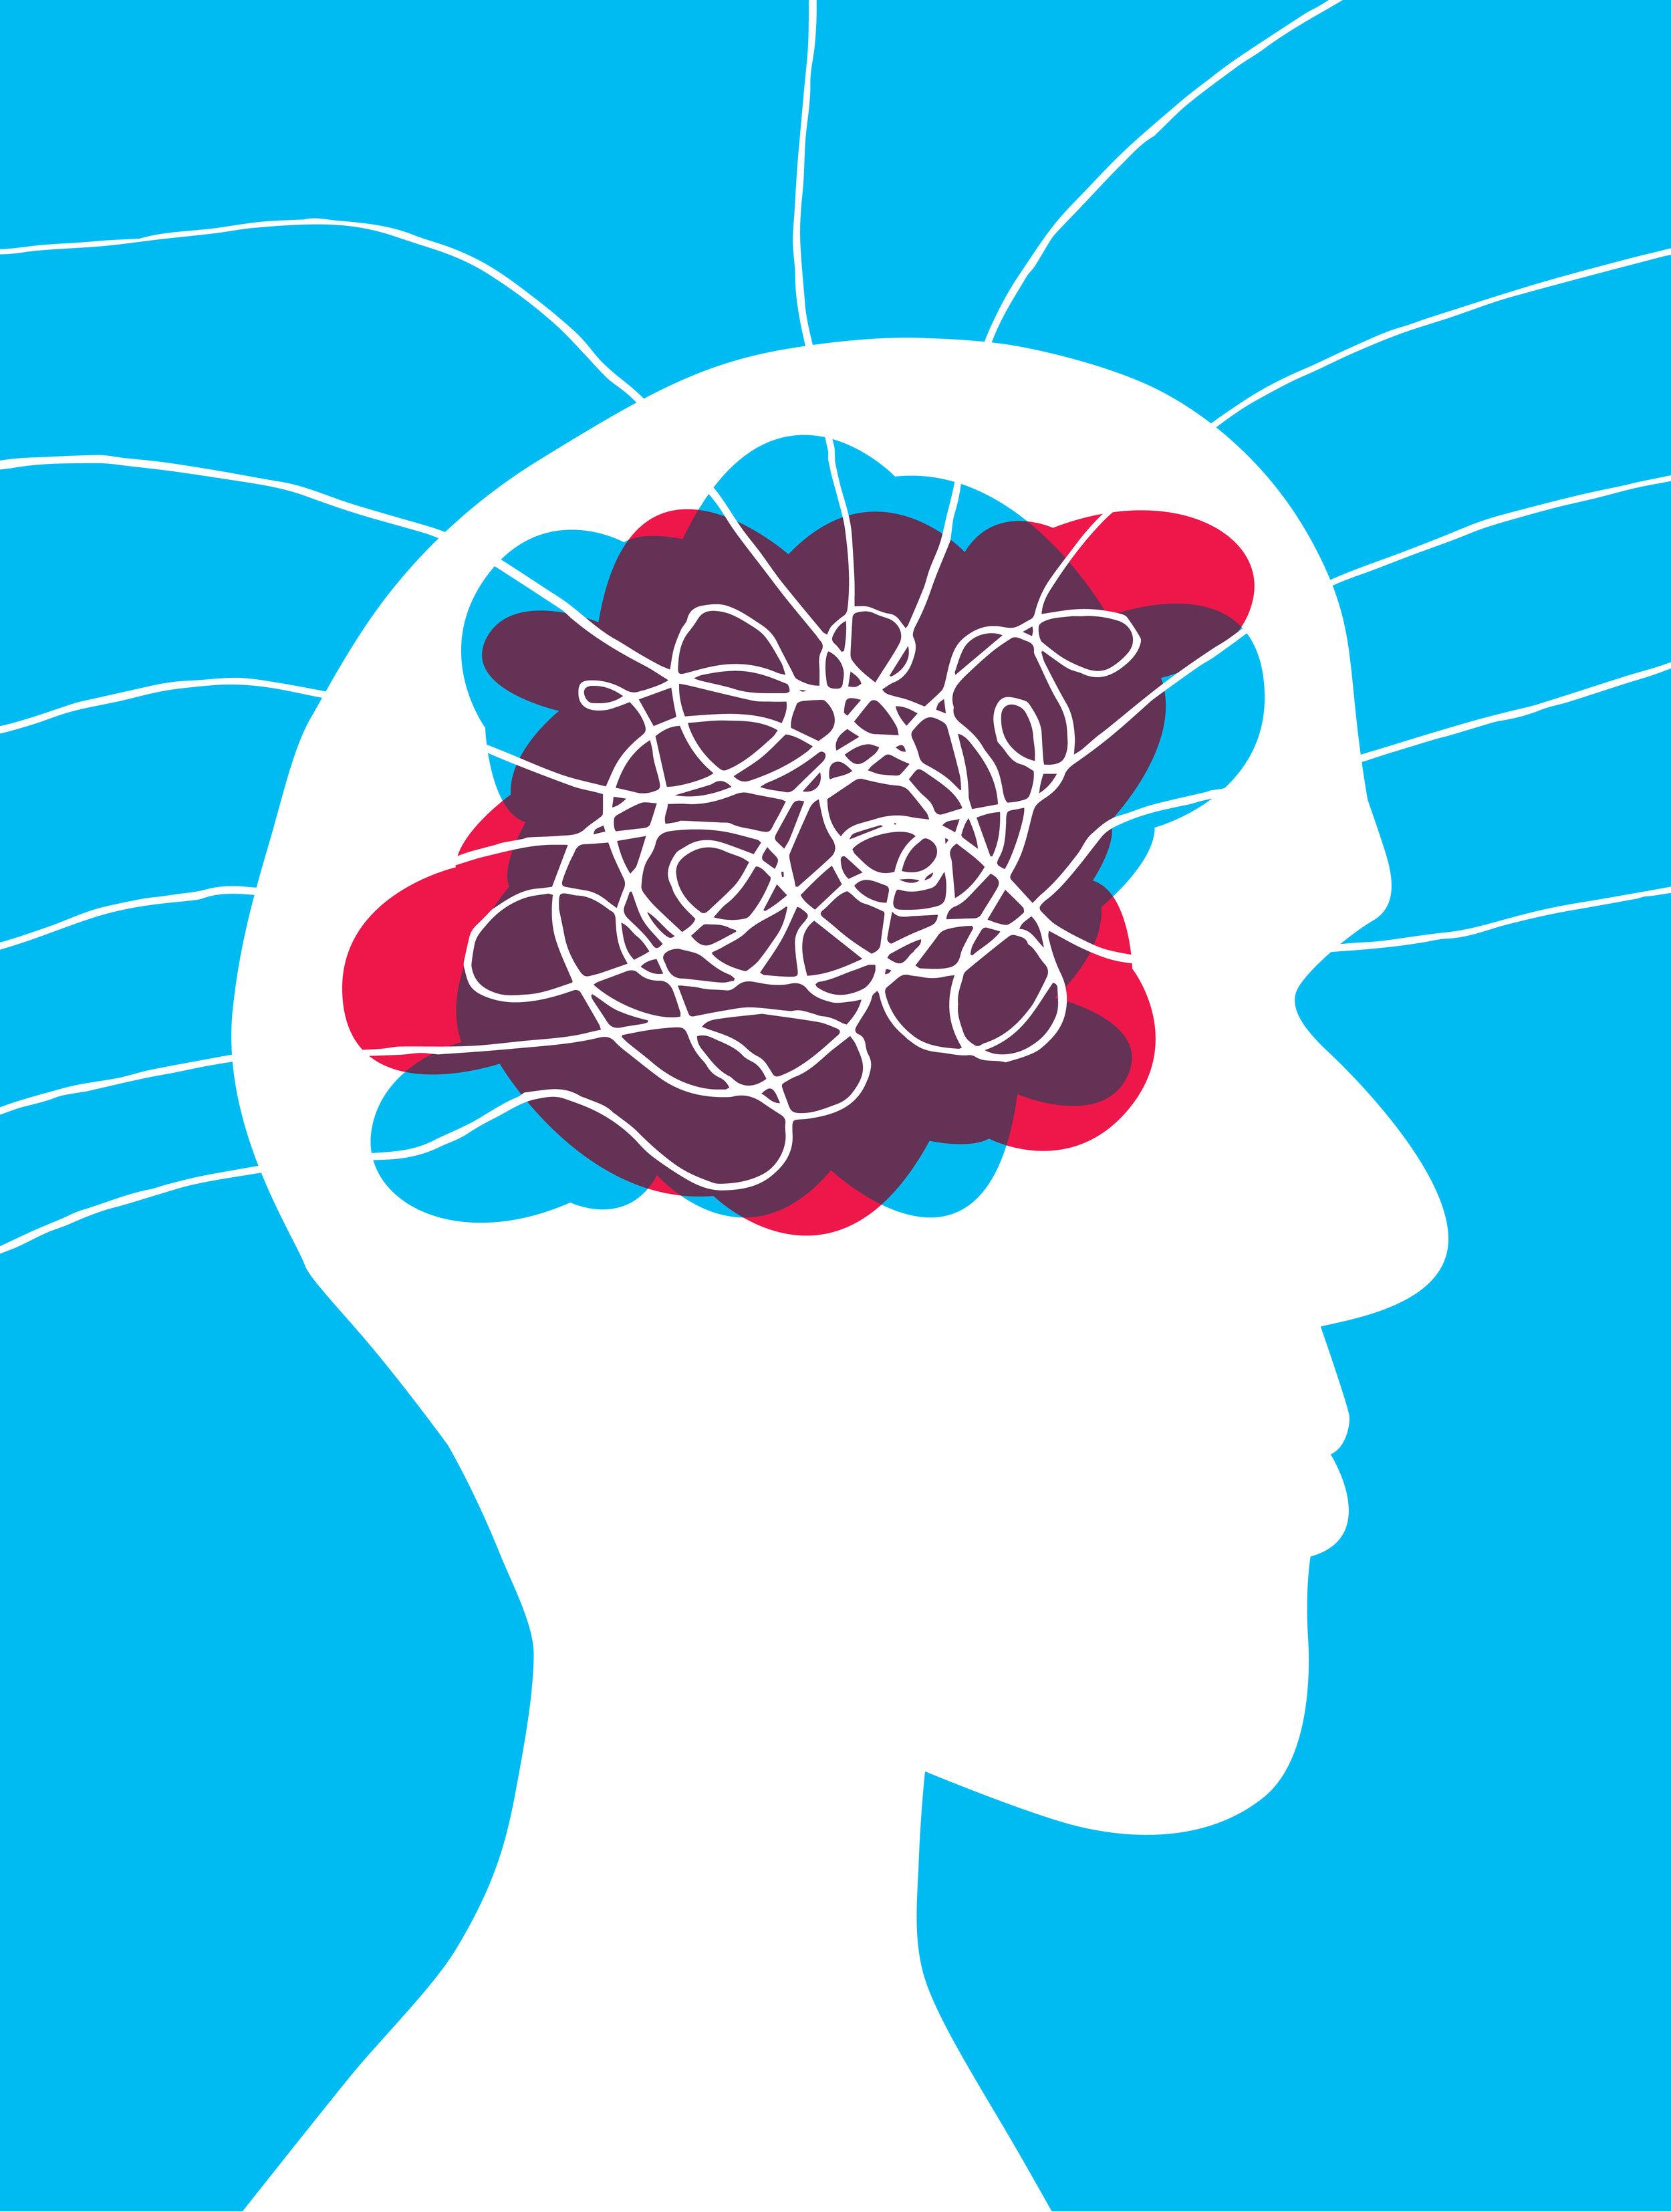 mindfulness-anxiety-counseling-seattle